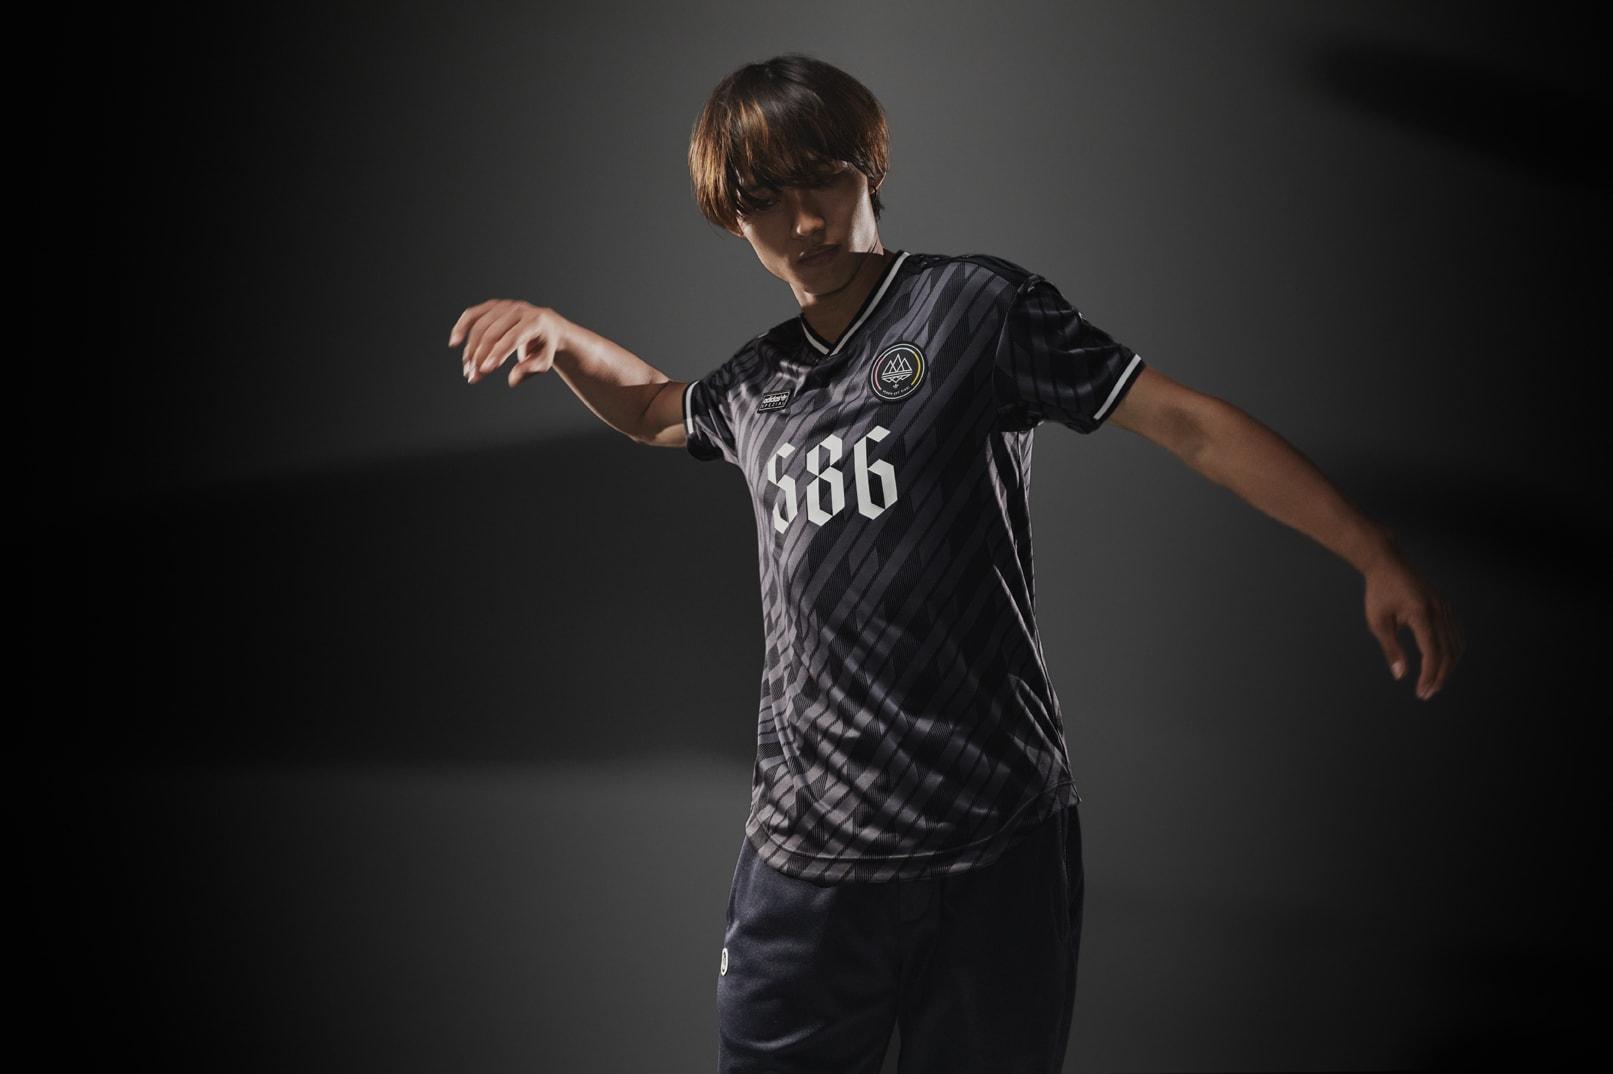 adidas New Order x SPZL Football Jersey - GK5738